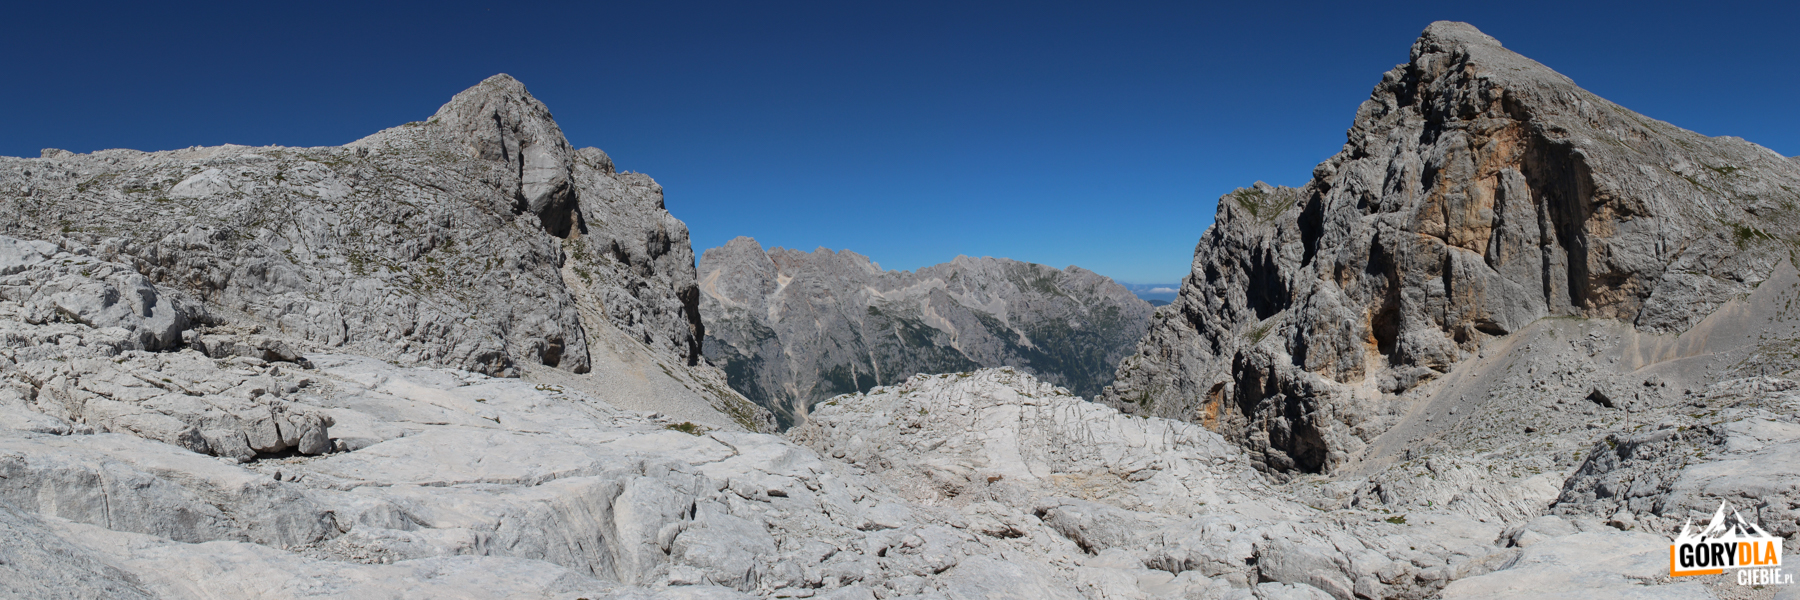 Widok ześrodka kotła naBegunjski vrh (2461 m)